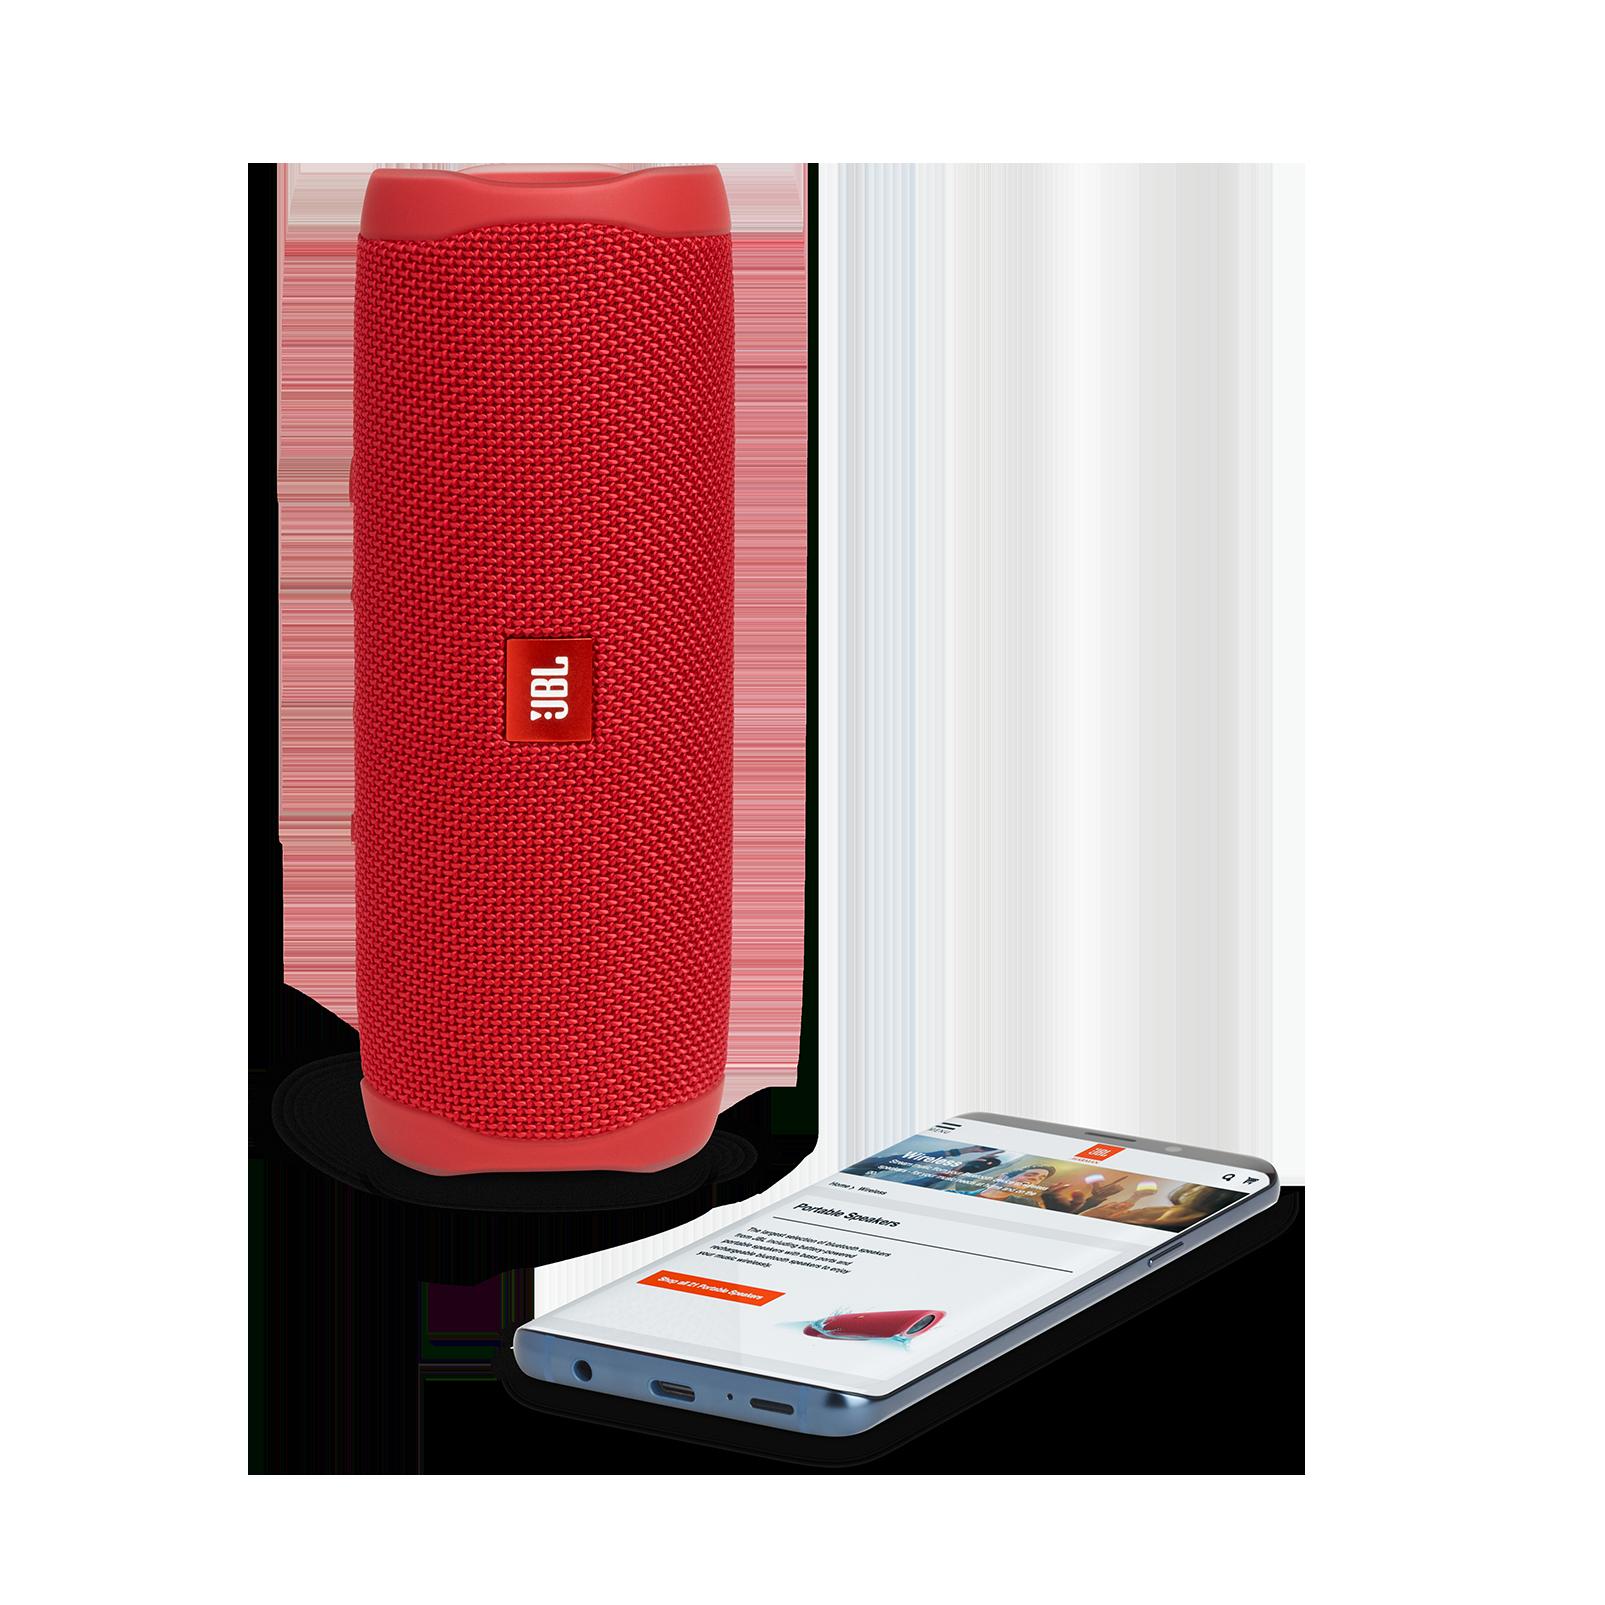 JBL FLIP 5 - Red - Portable Waterproof Speaker - Detailshot 2